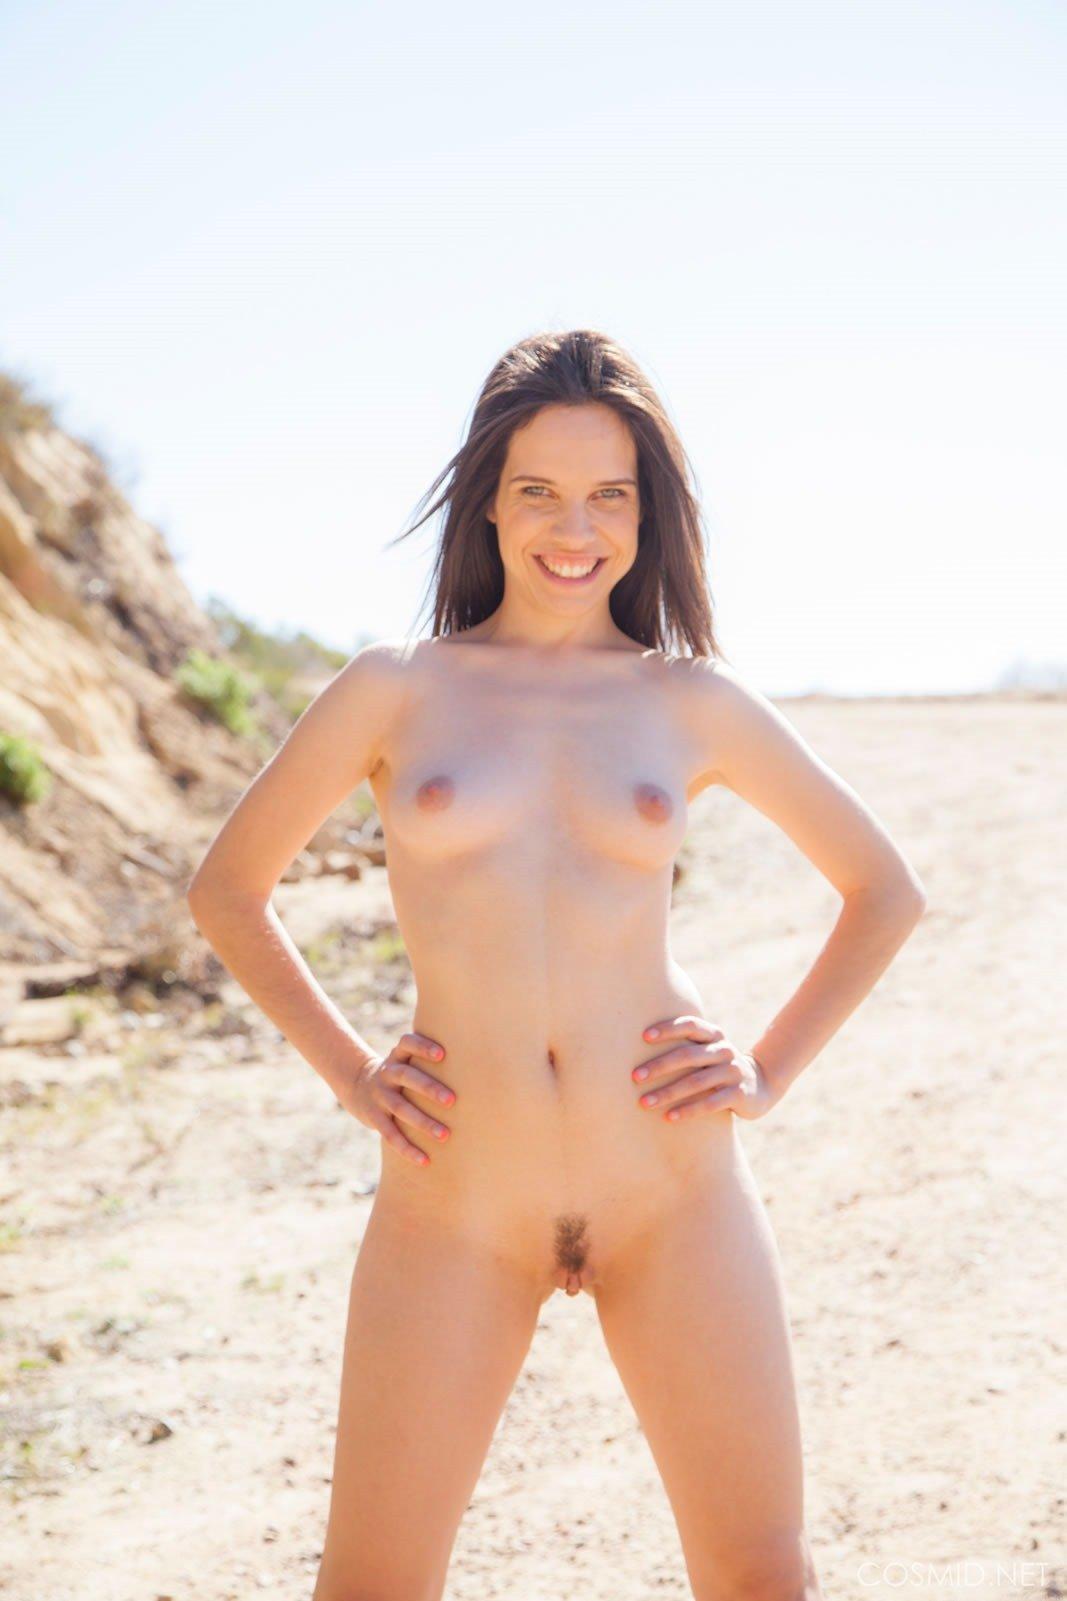 Fey Martin Hiking Nudes - Fine Hotties - Hot Naked Girls ...